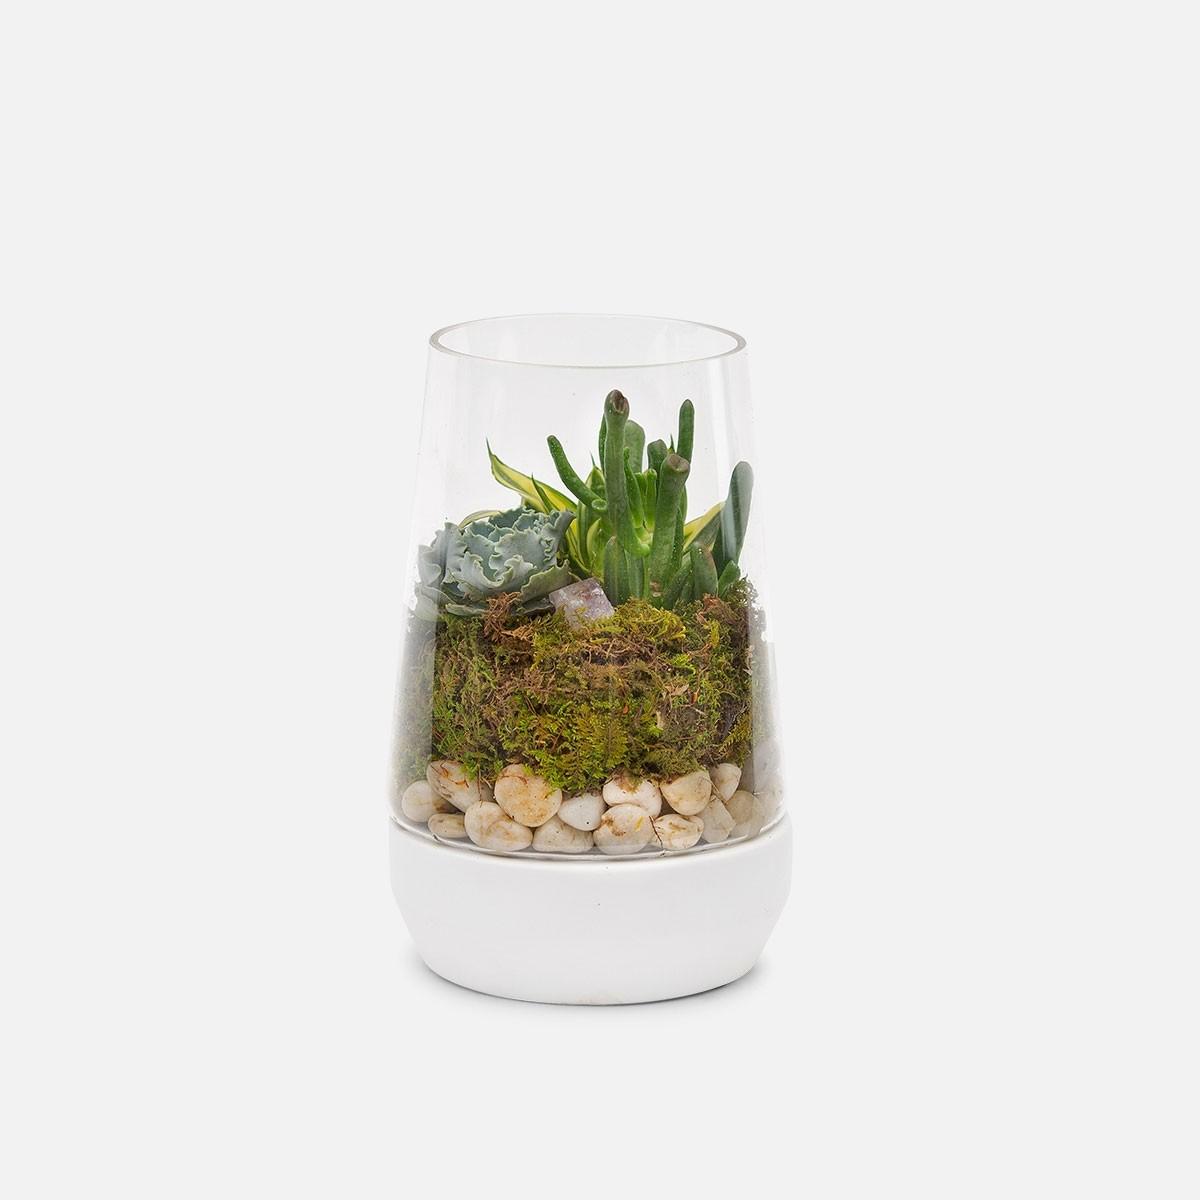 Small Desert Crystal Terrarium Plant Delivery Nyc Plantshed Com